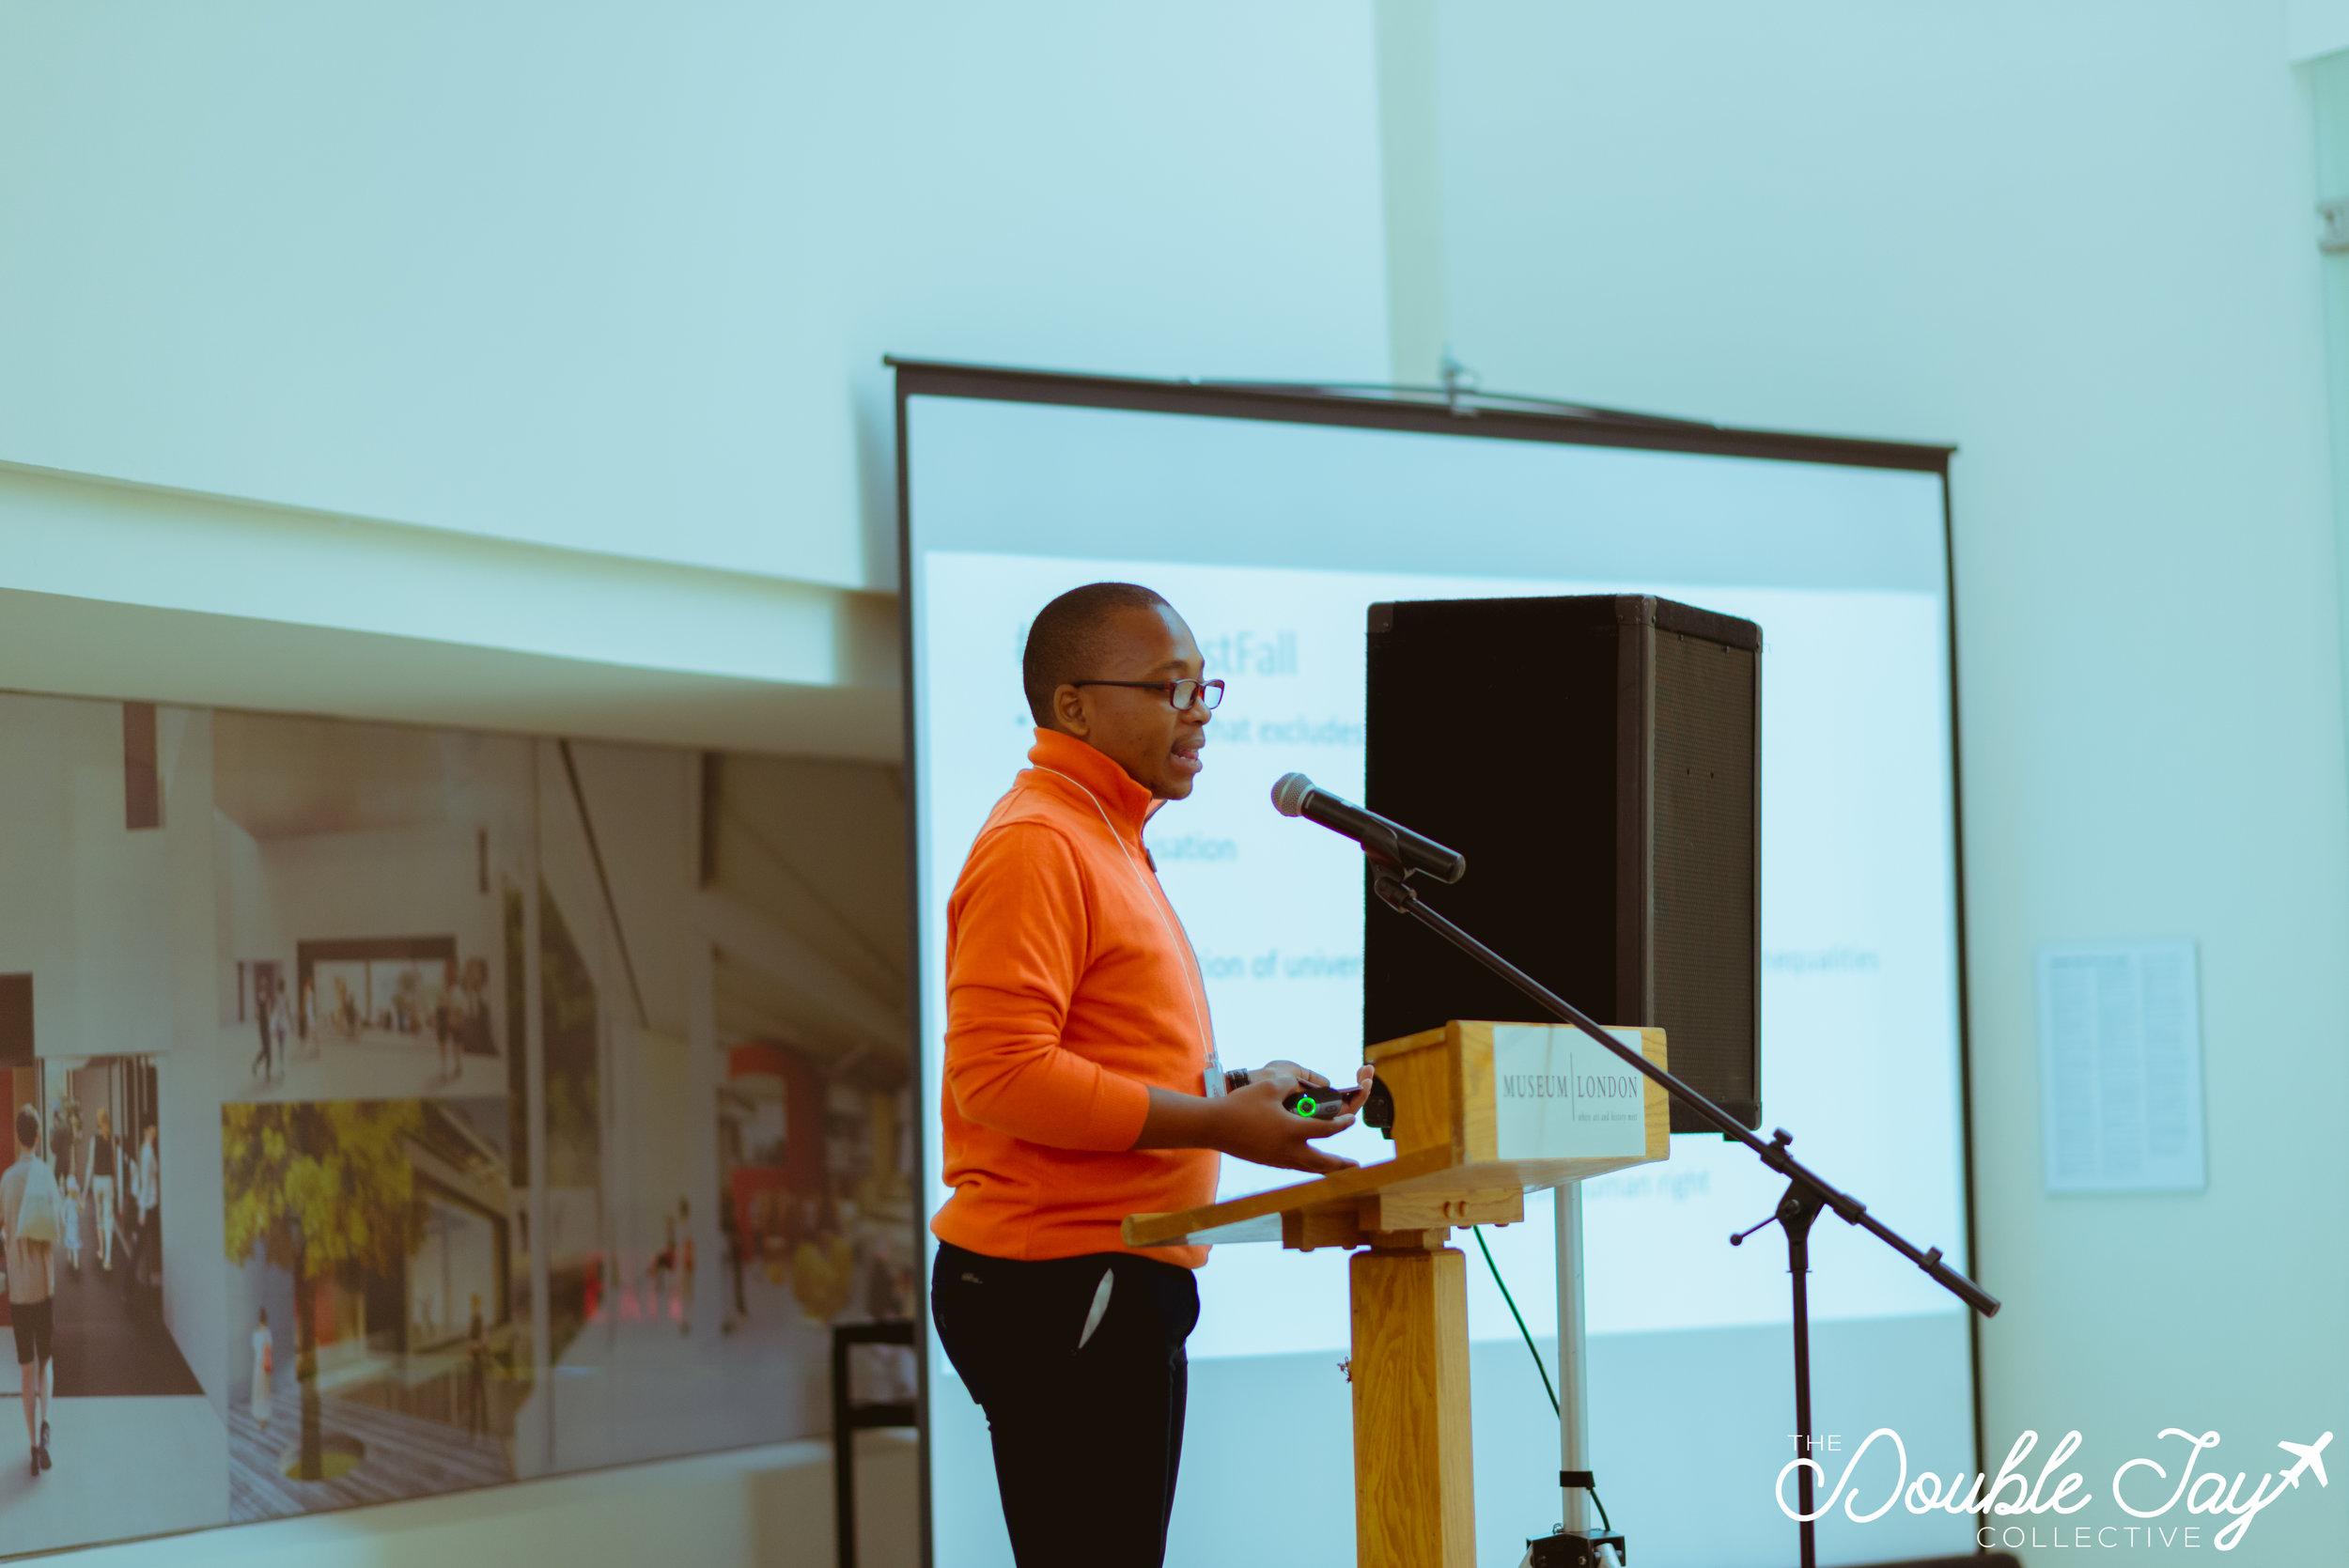 Kgothatso Mokgele,from the University of Johannesburg, as he gave his talk on the #FeesMustFall movement.